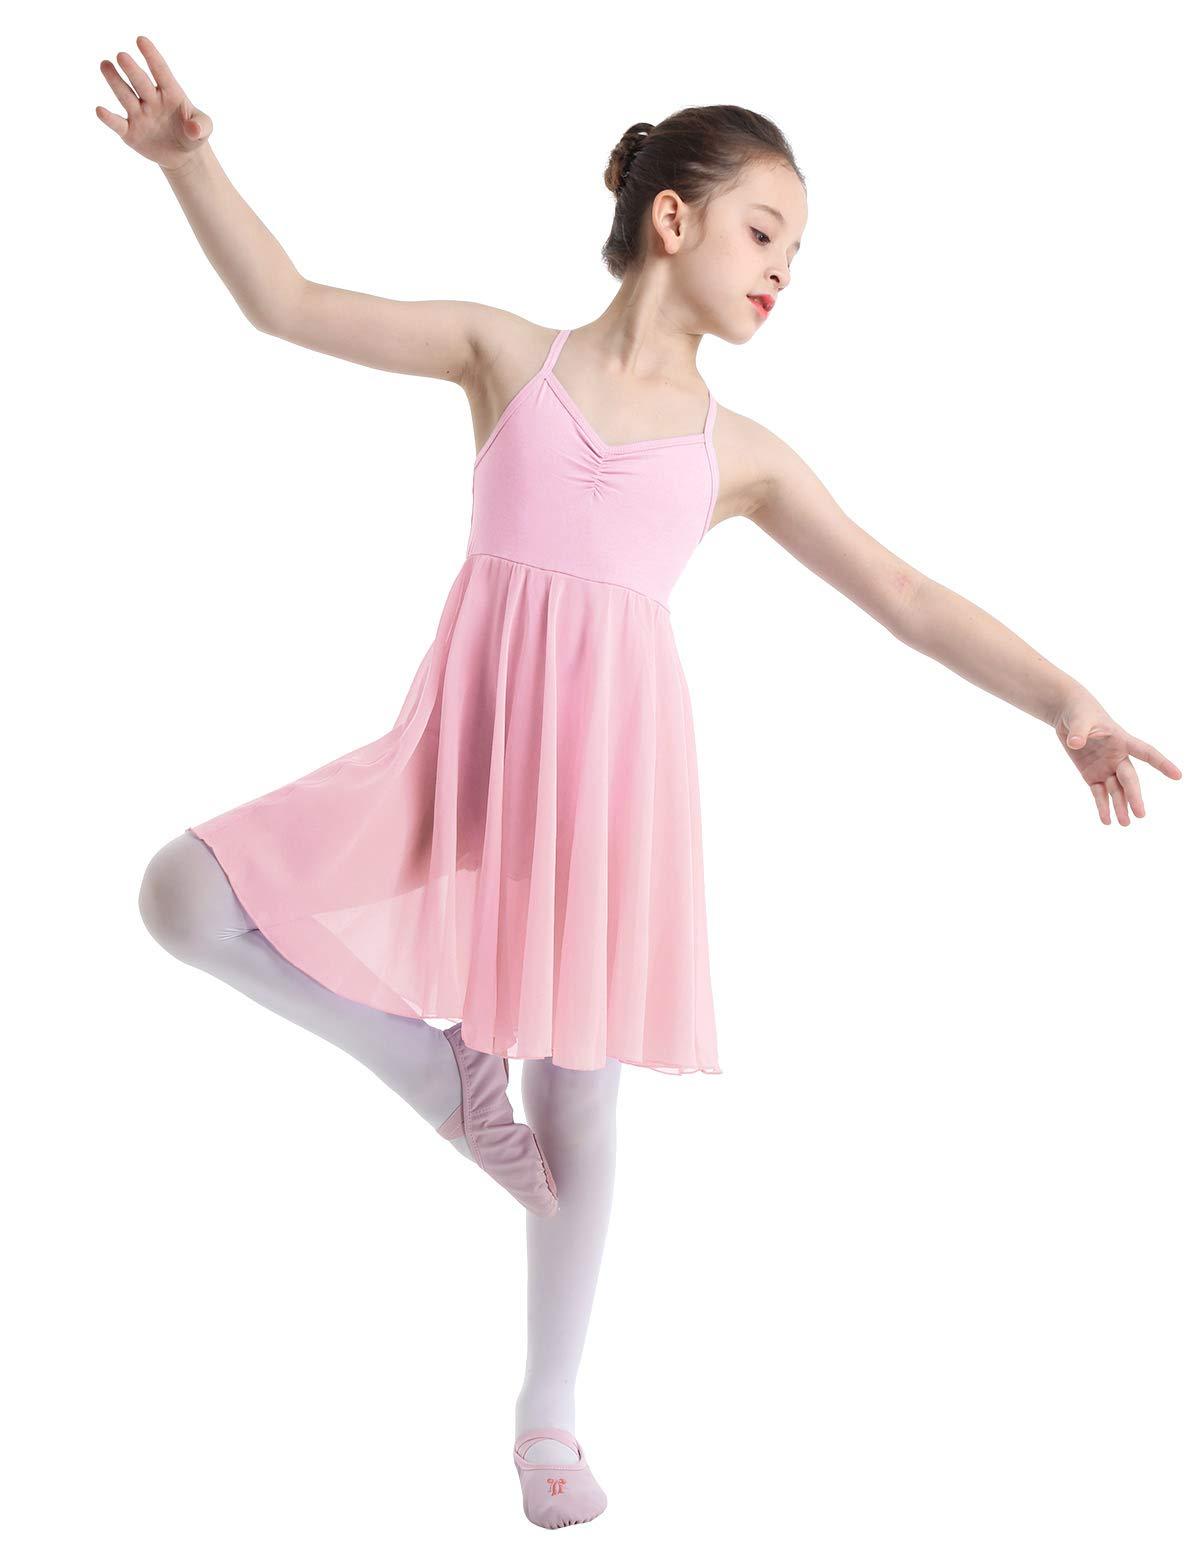 UK Girls Lyrical Ballet Dance Dress Modern Ballroom Leotards Dancewear Costume